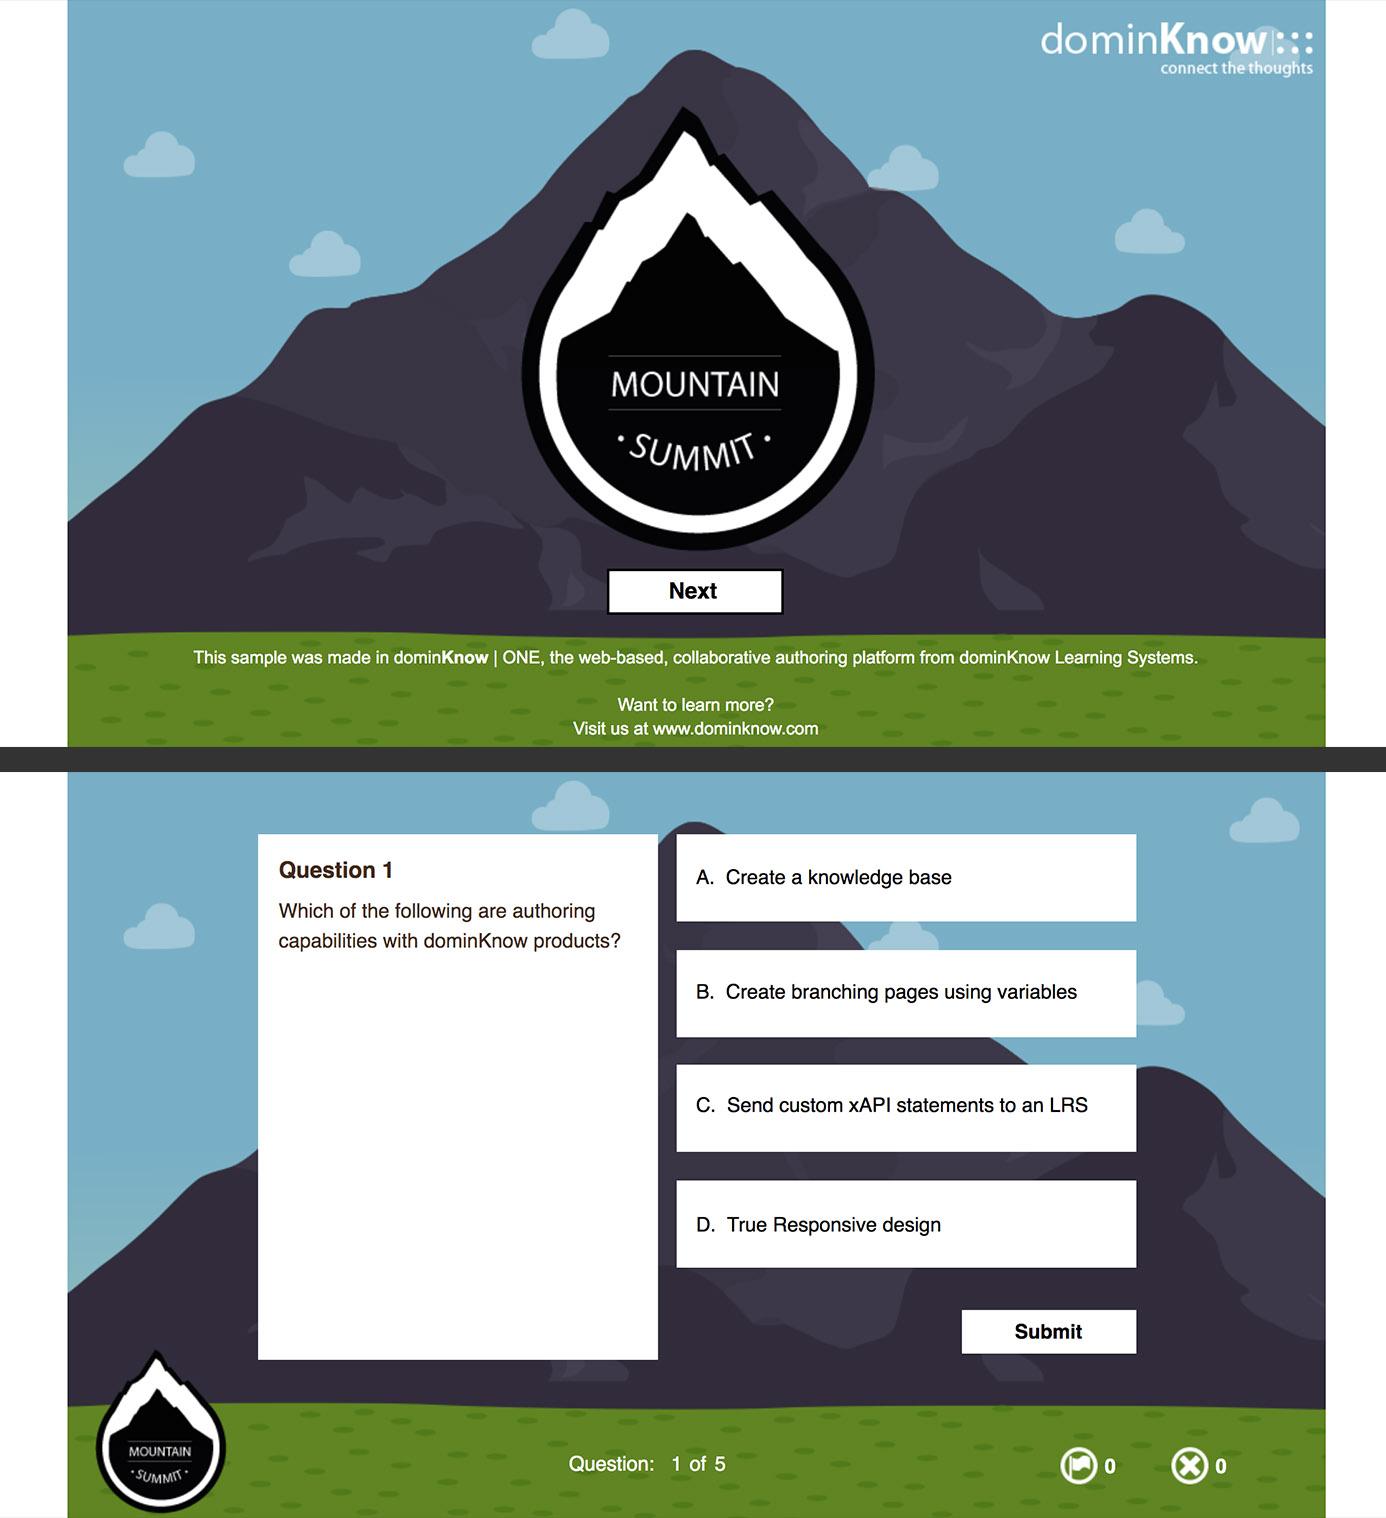 Mountain Summit screenshots